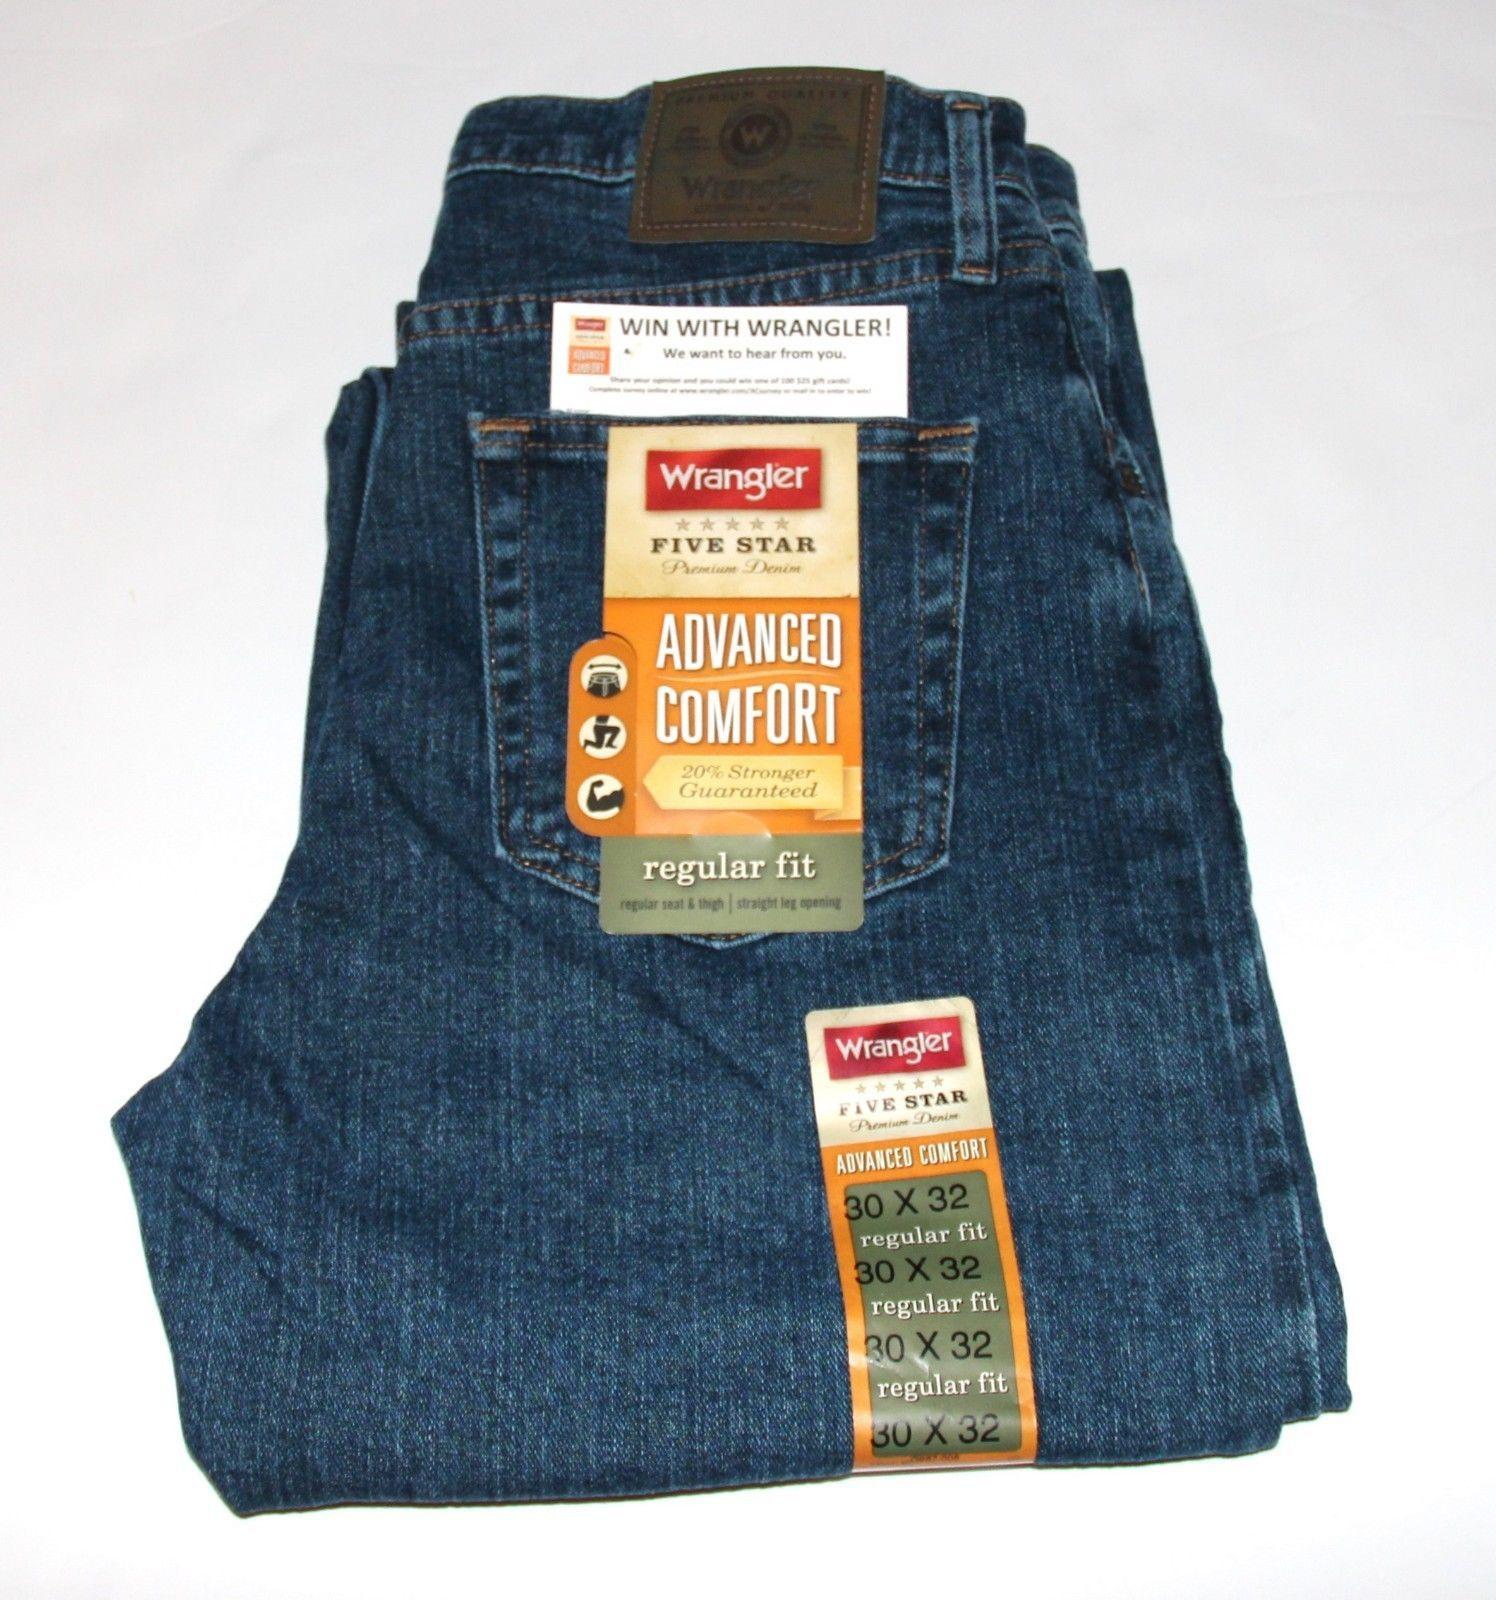 345d5975 Wrangler Fivestar Premium Denim Advanced Comfort Regular Fit Jean Men'S Size